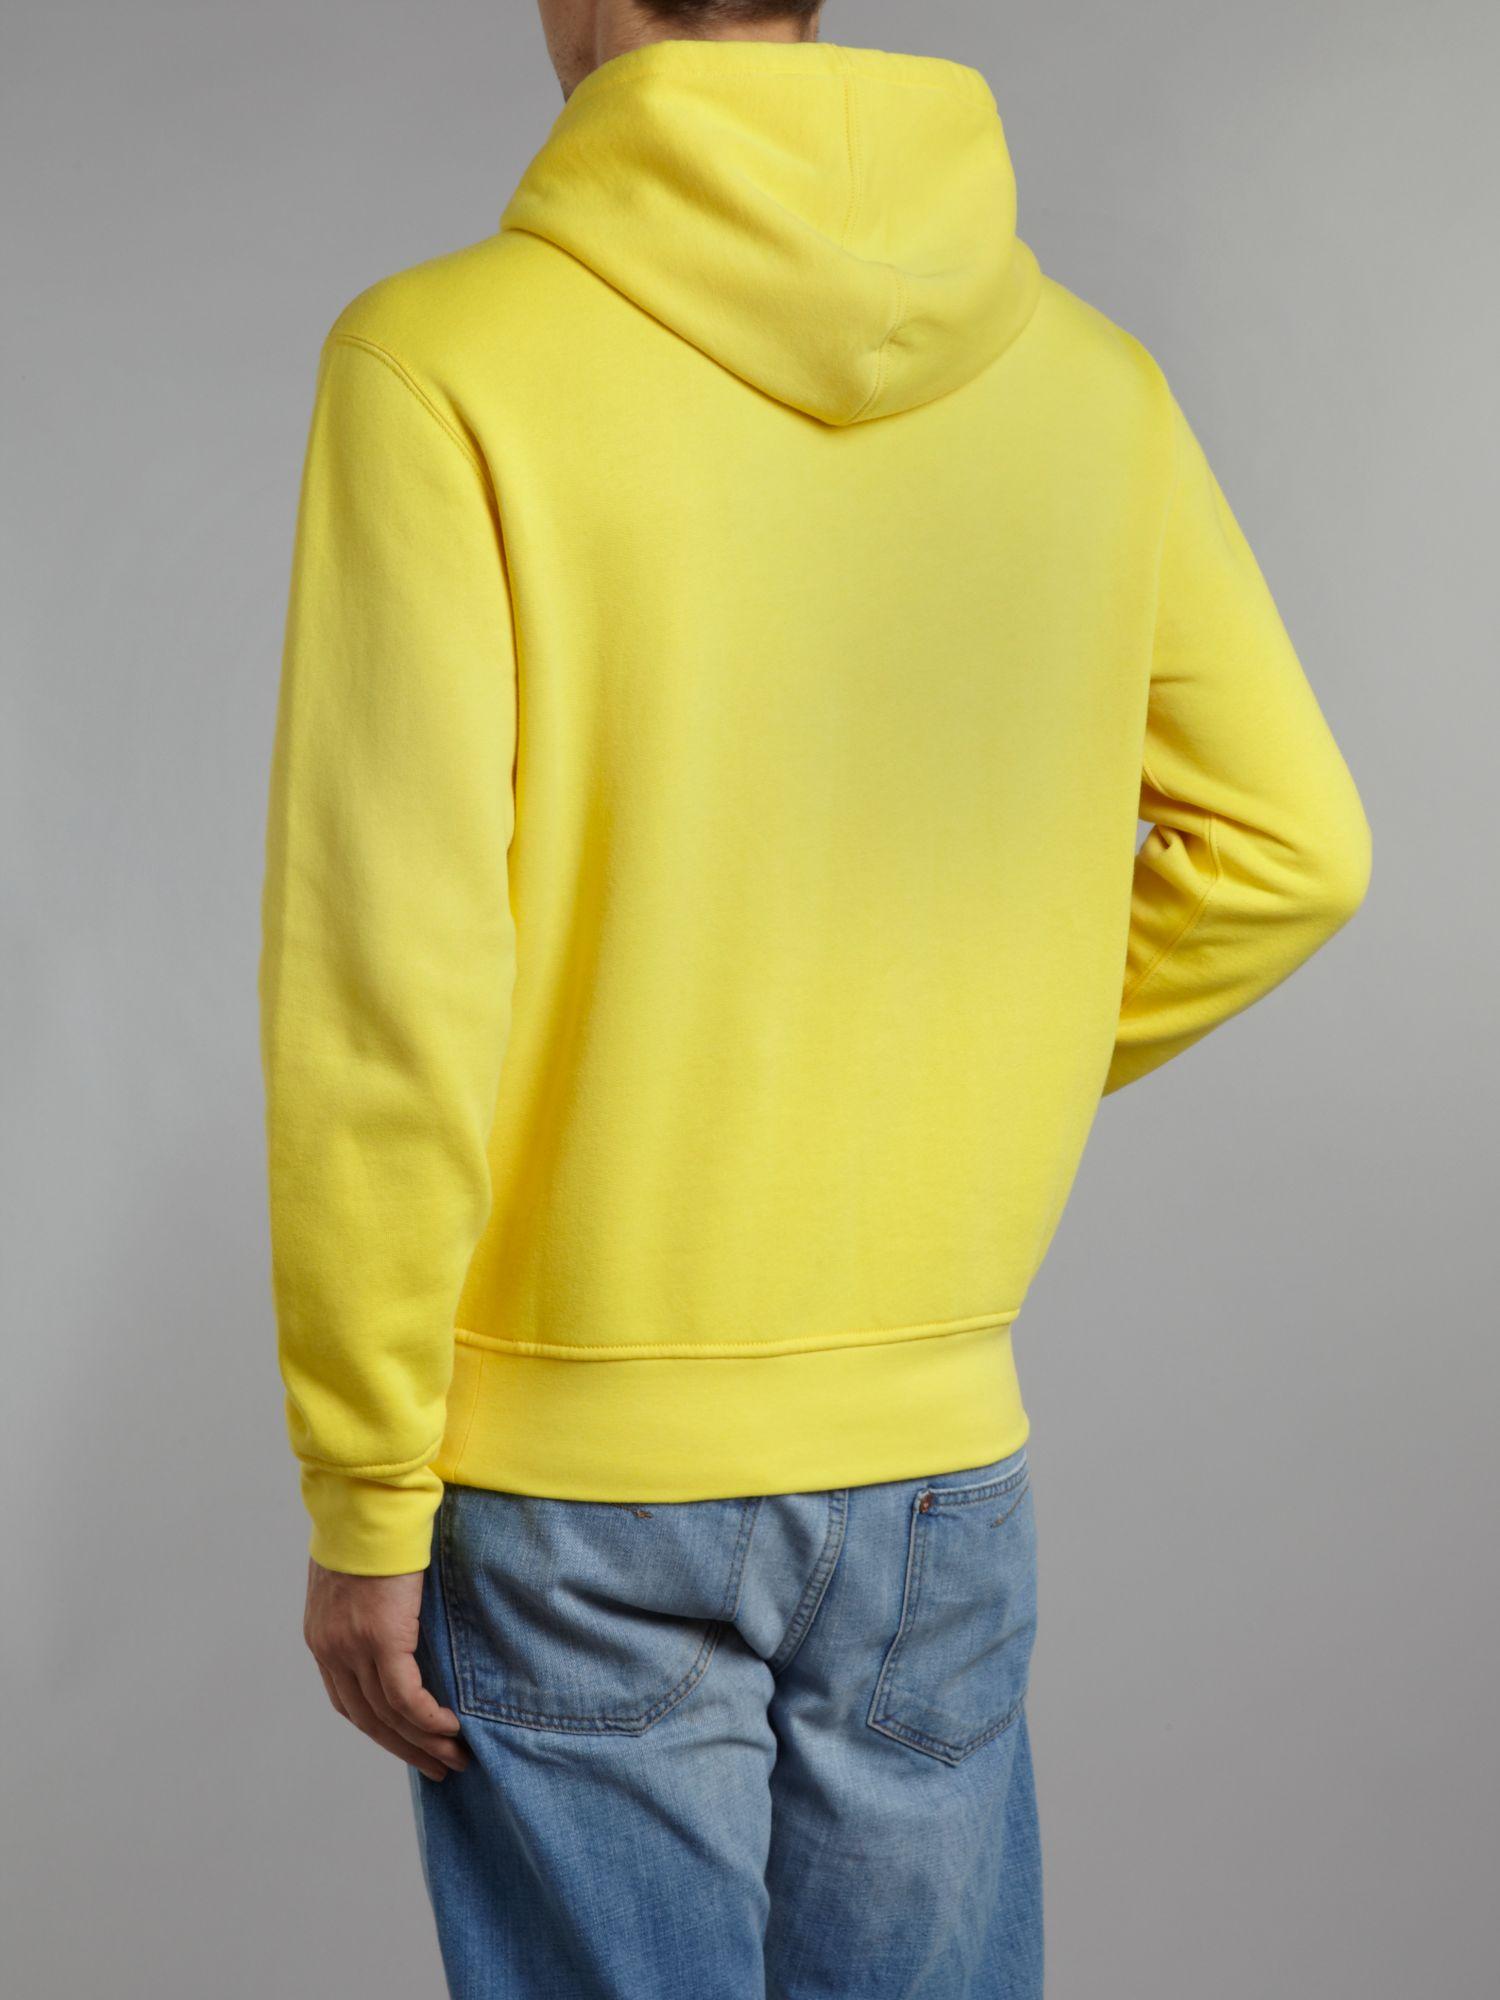 Ralph Lauren Polo Classic Big Pony Sweatshirt Ivory